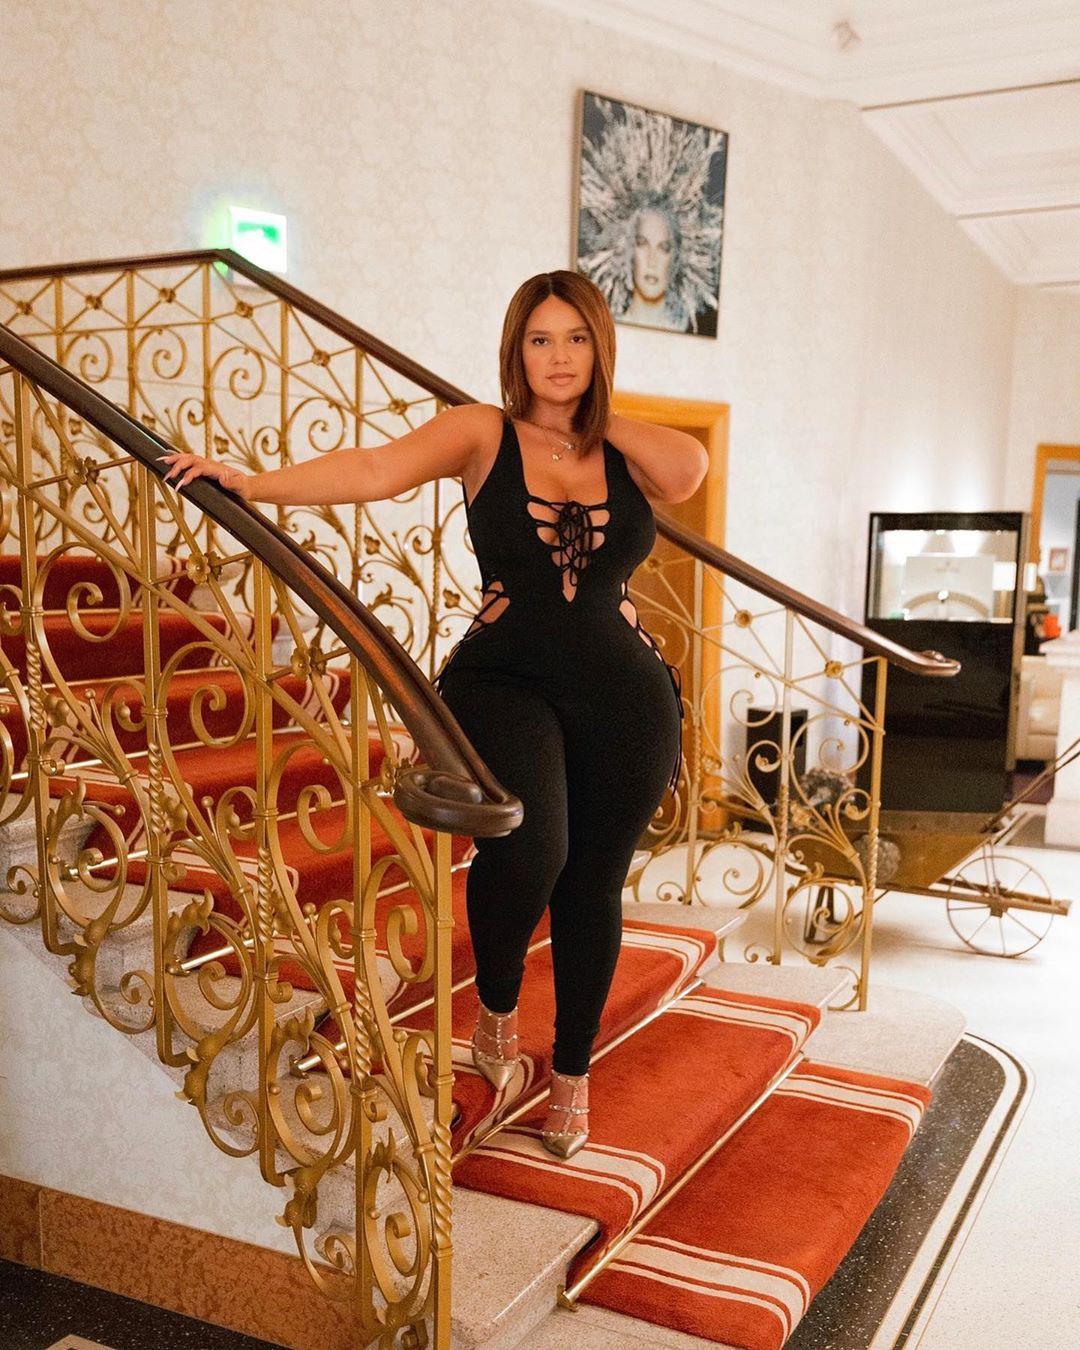 Pamela Alexandra sportswear colour ideas, photoshoot poses, hot girls thighs